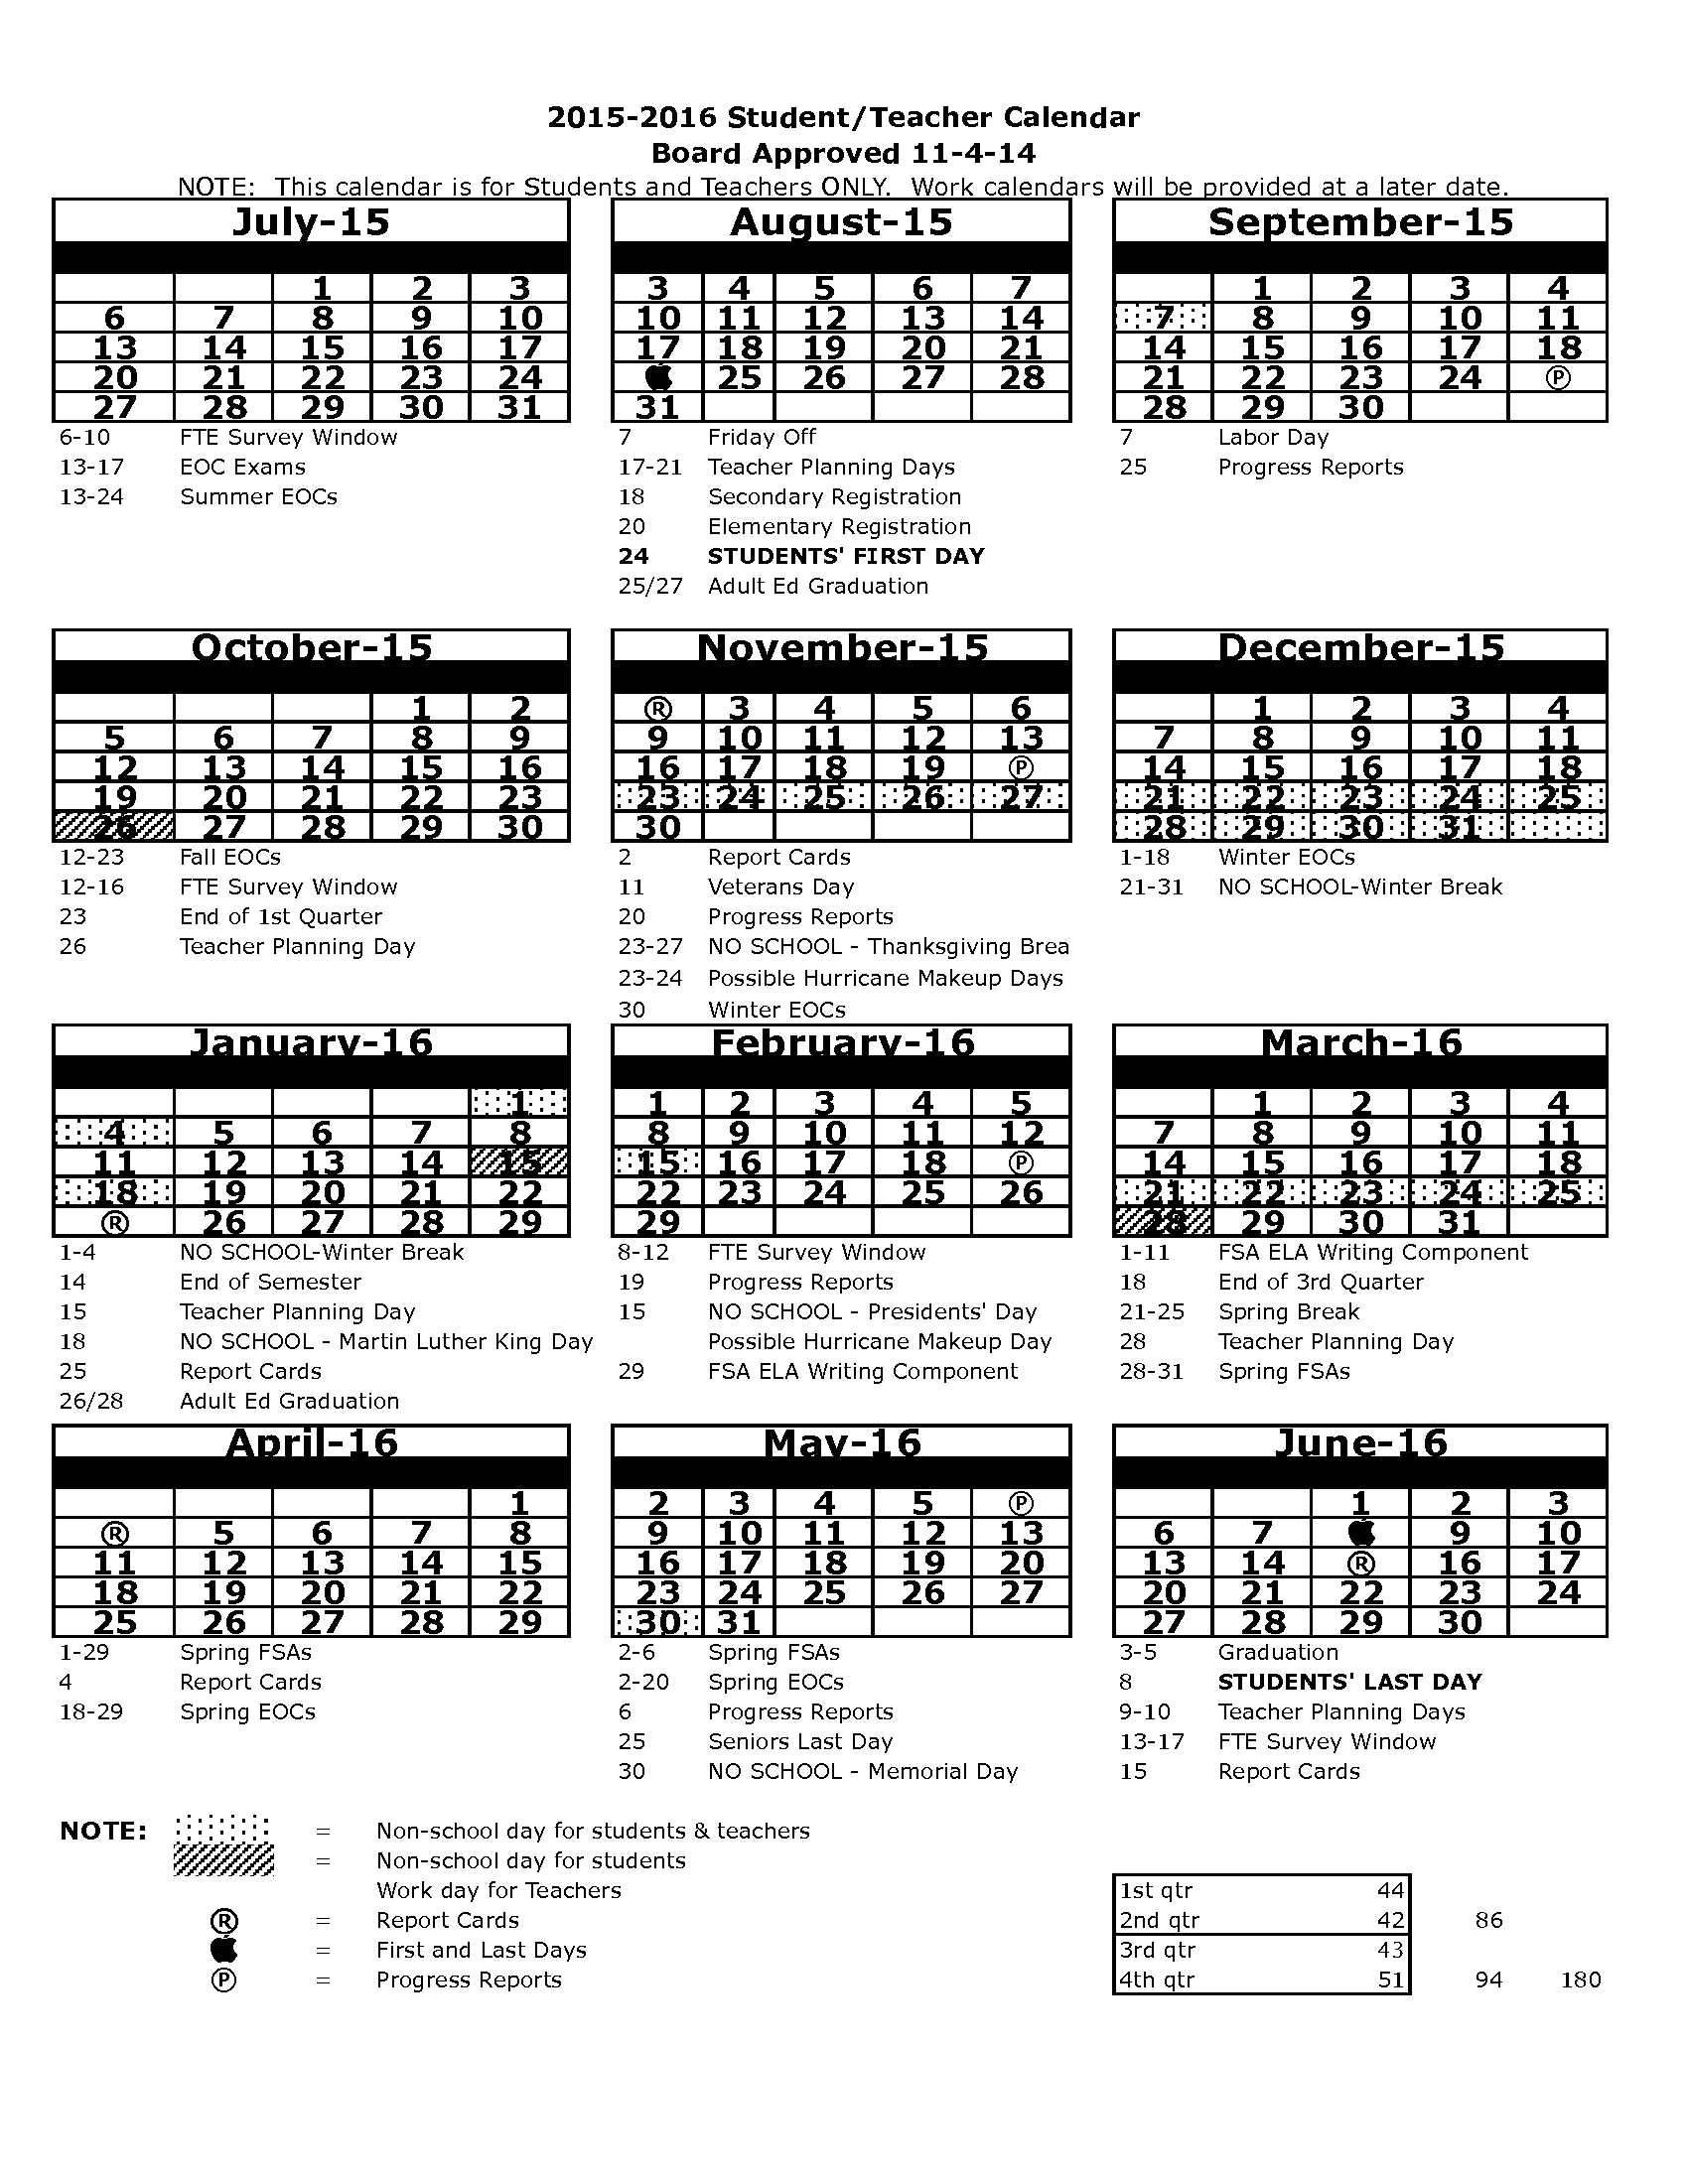 Pasco County Schools Start August 24